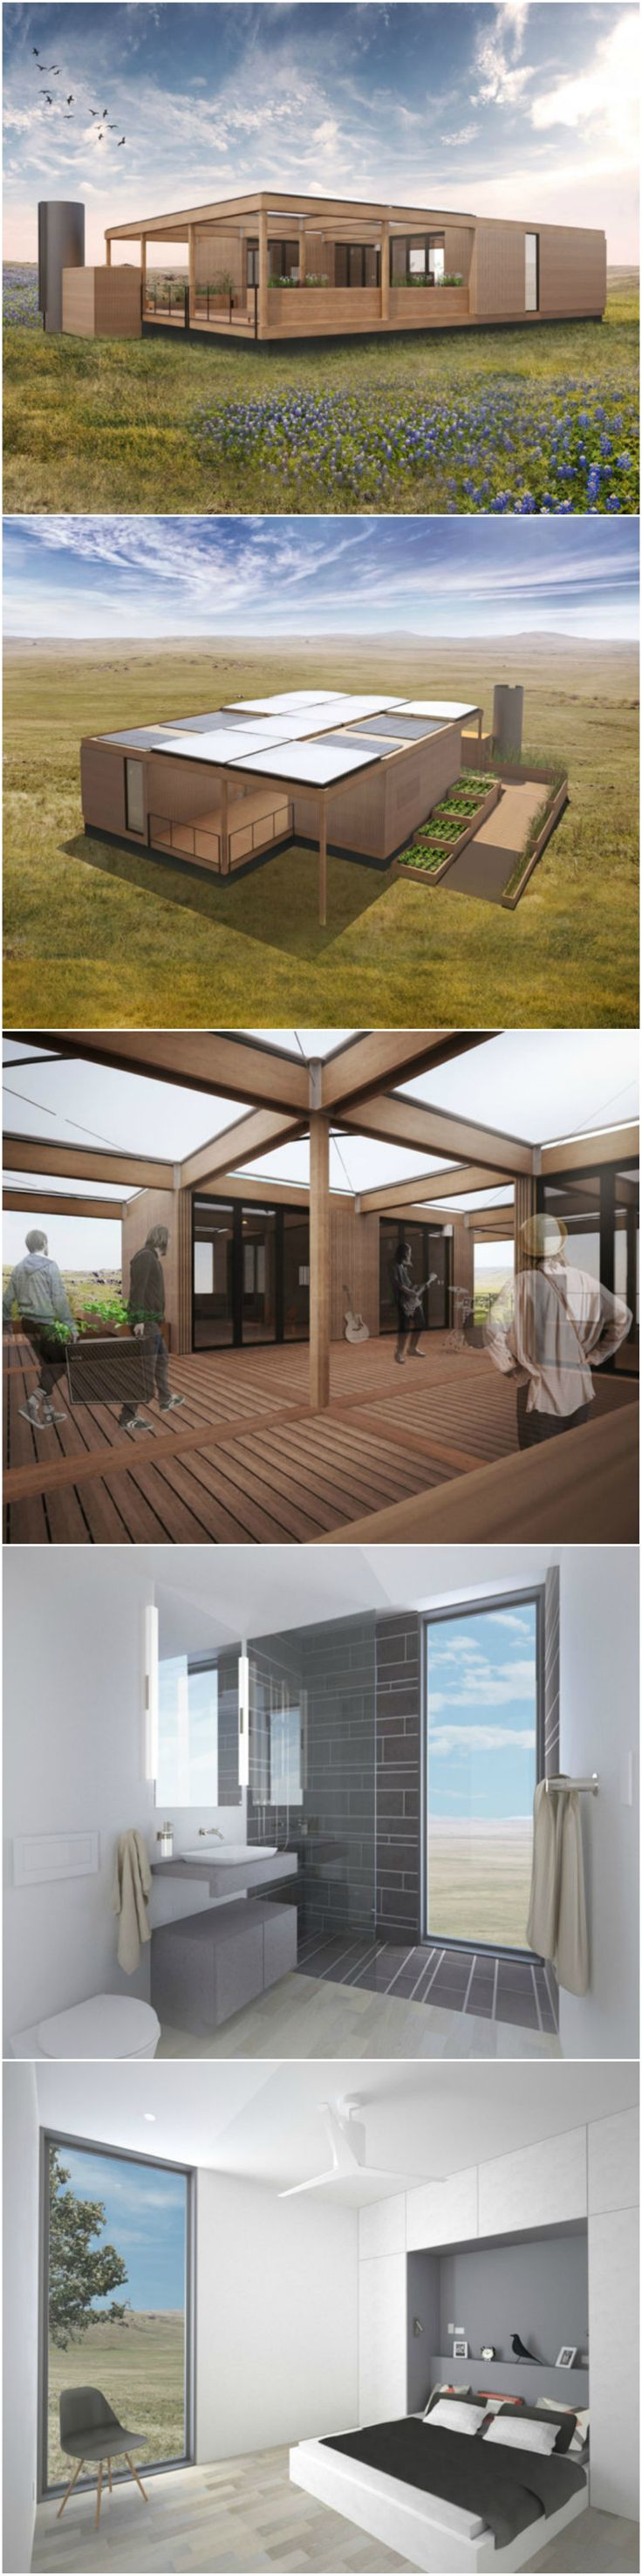 Texas Modular Home Will Run on Rainwater and Sunshine Alone